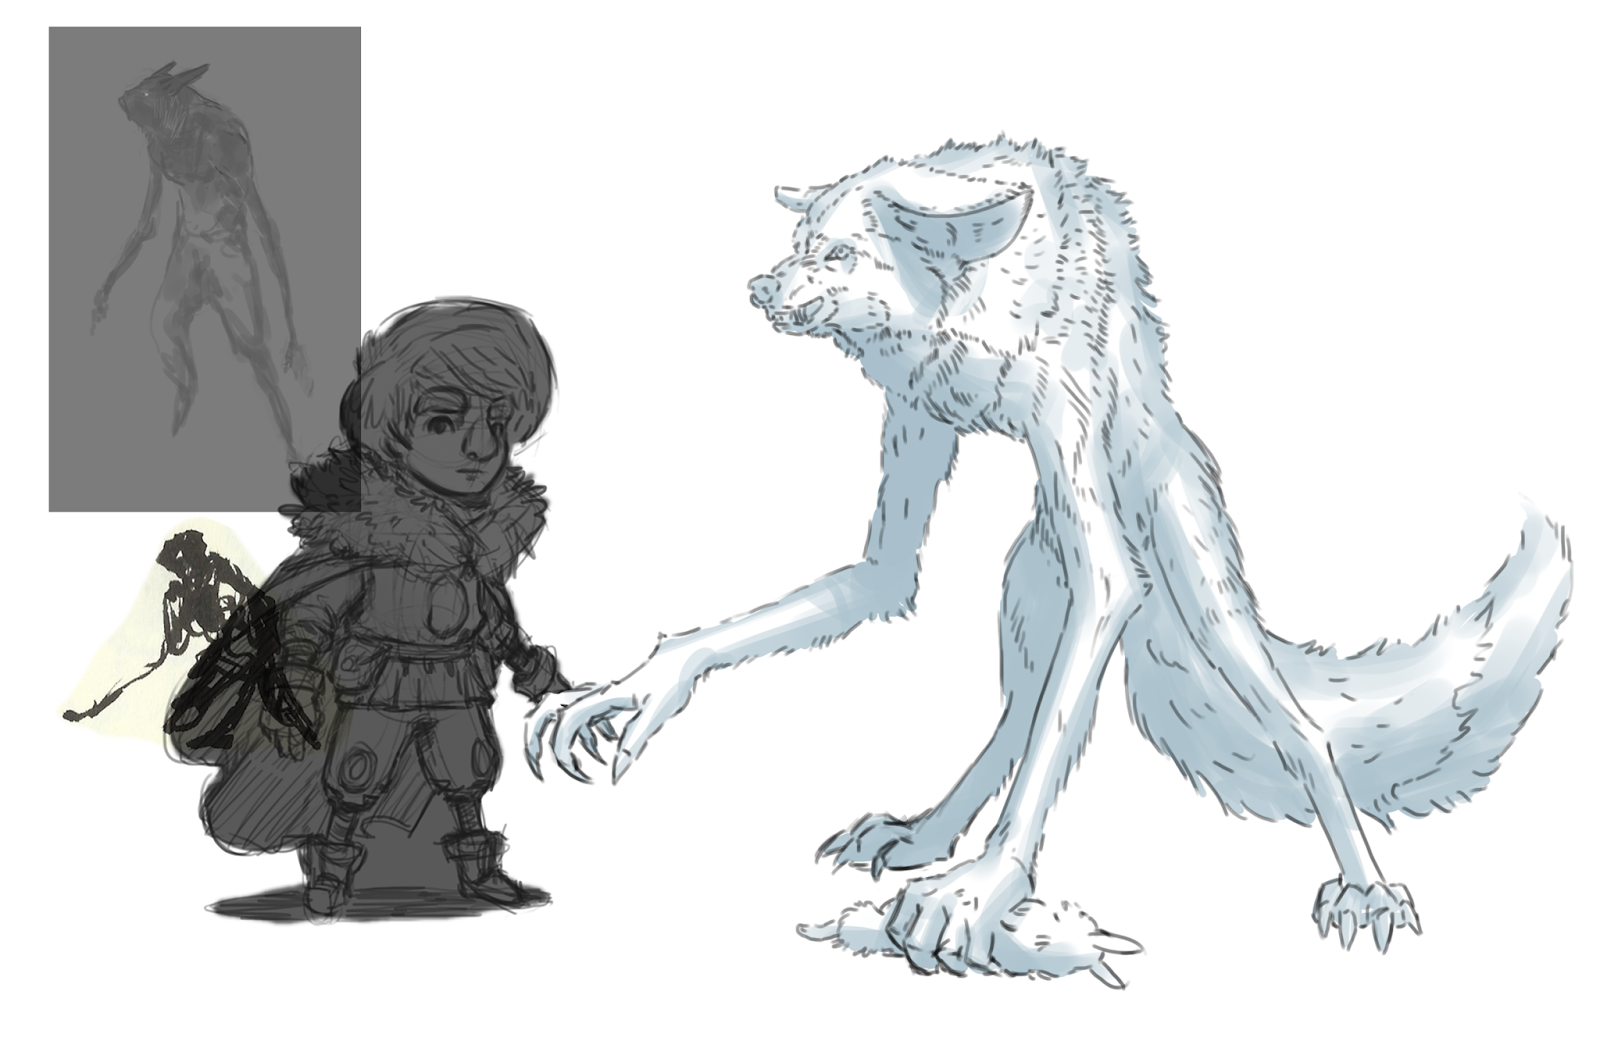 [Image: 2017_05_10_werewolf.png]